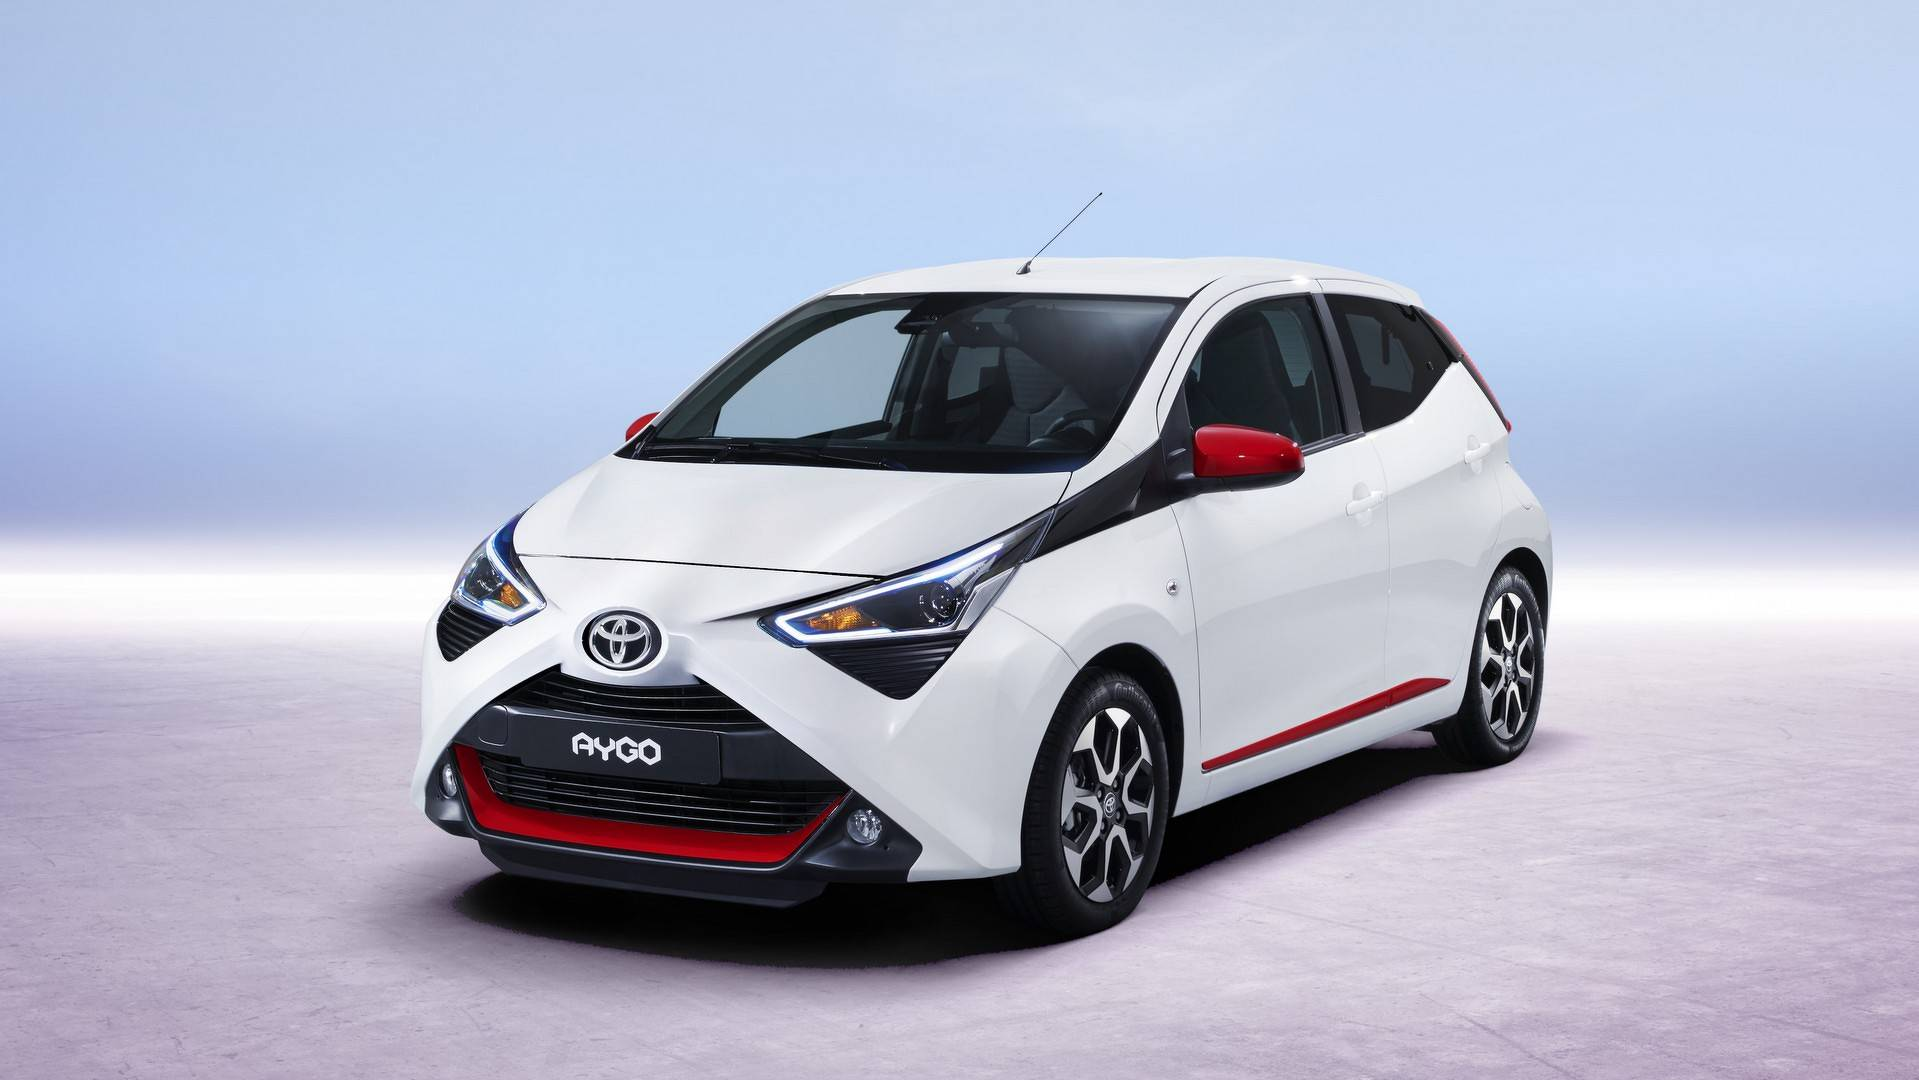 2018 Toyota Aygo Facelift Previews Ahead of Geneva 17